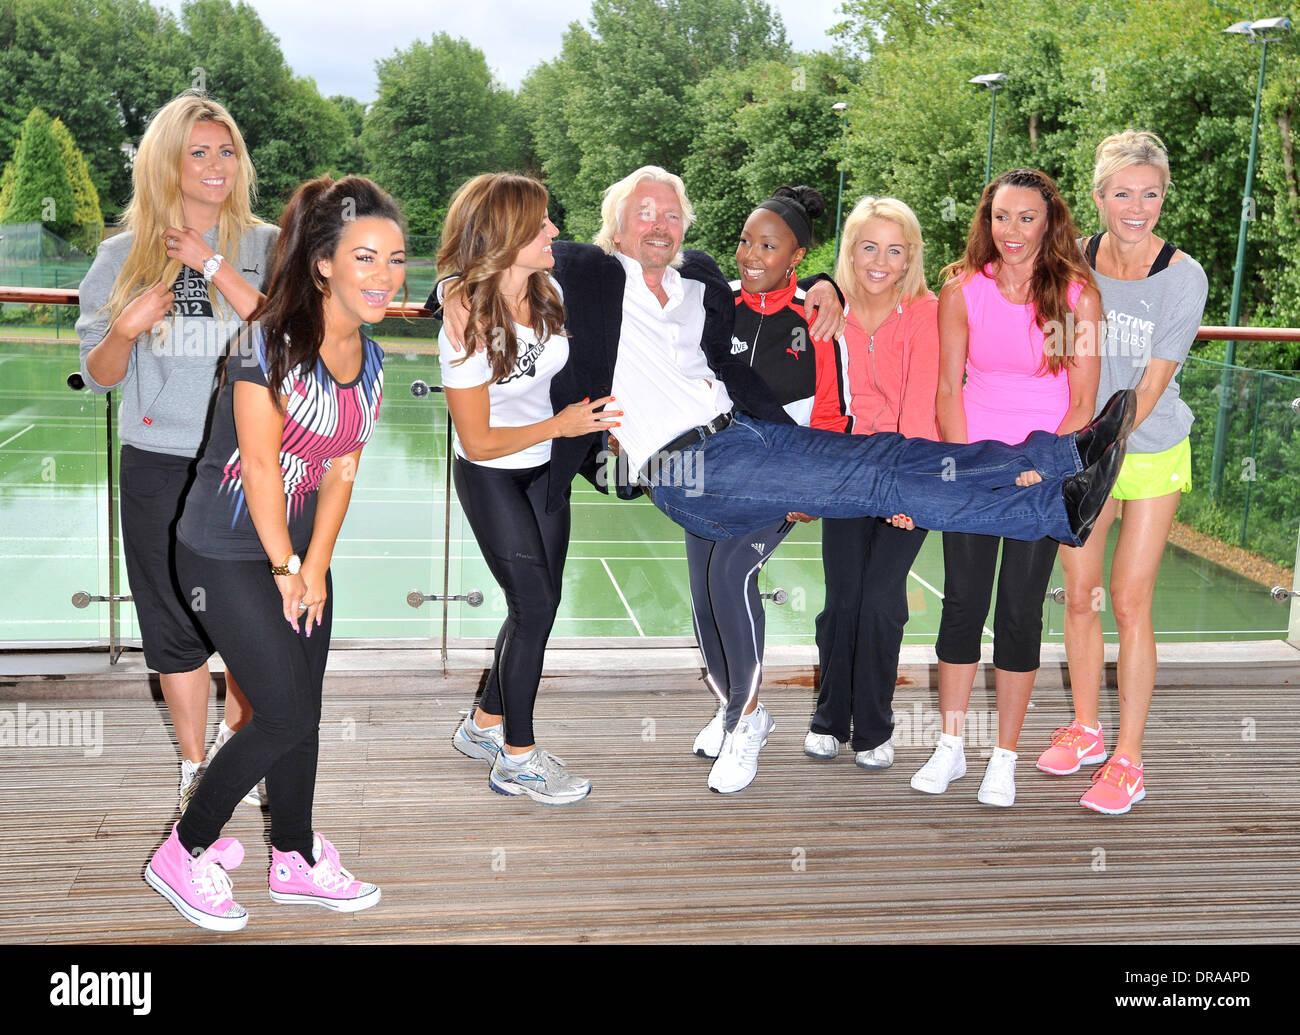 Sir Richard Branson, Amy Guy, Lydia Bright, Hayley McQueen, Chelsee Healey,